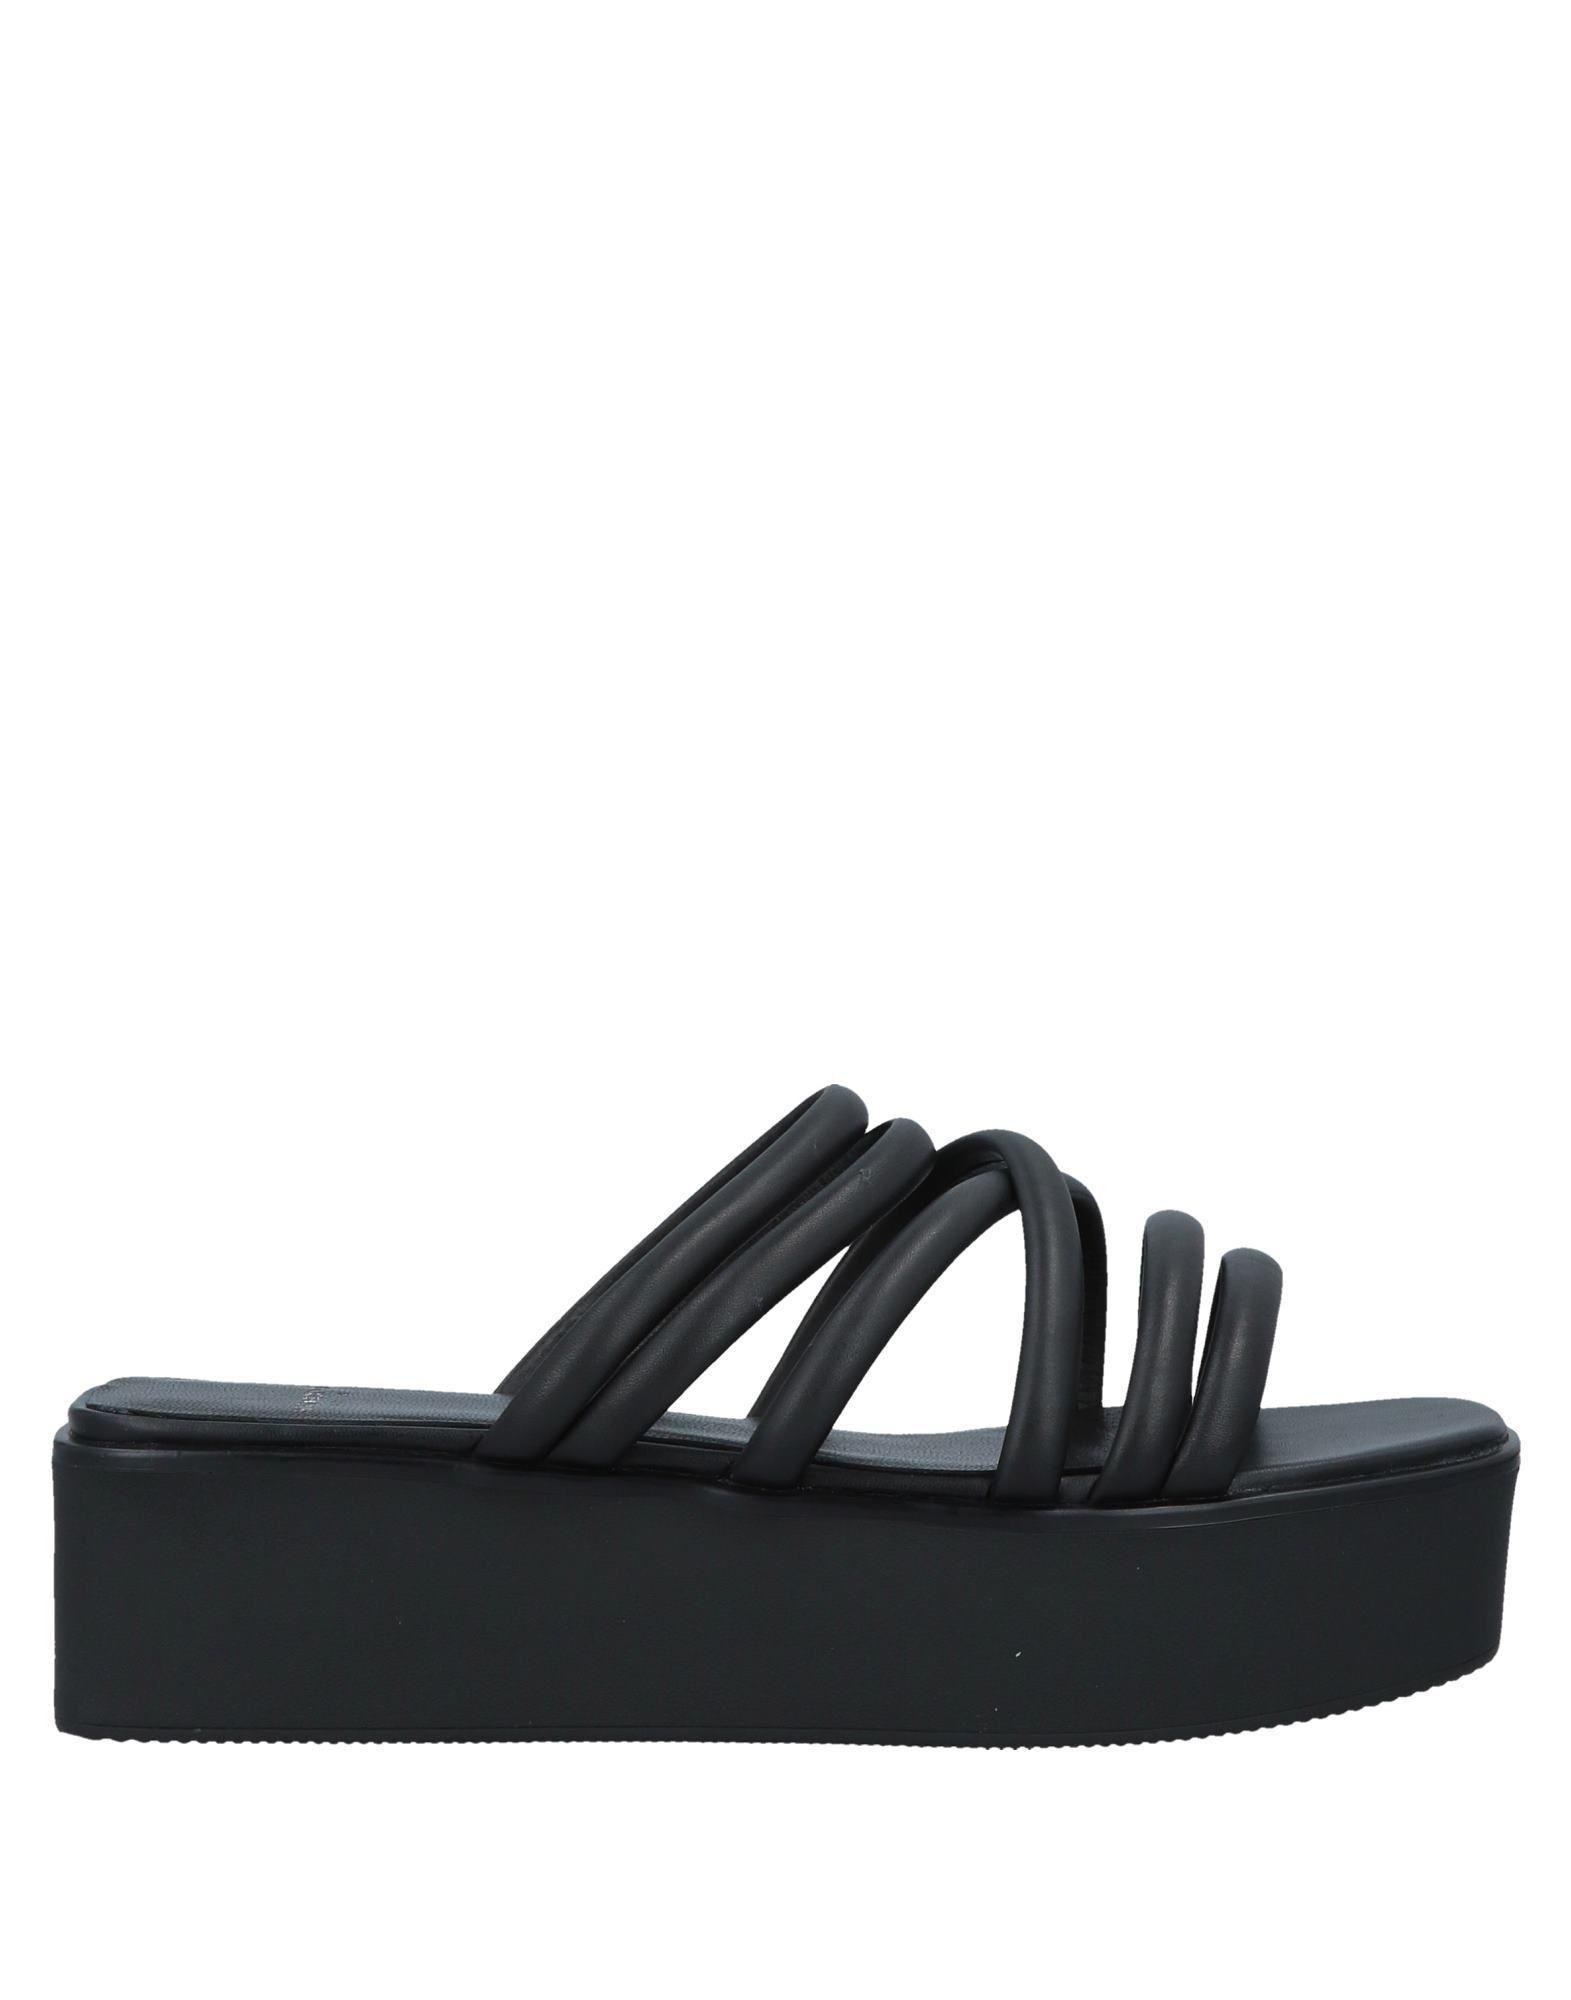 b890a81d66 Lyst - Vagabond Sandals in Black